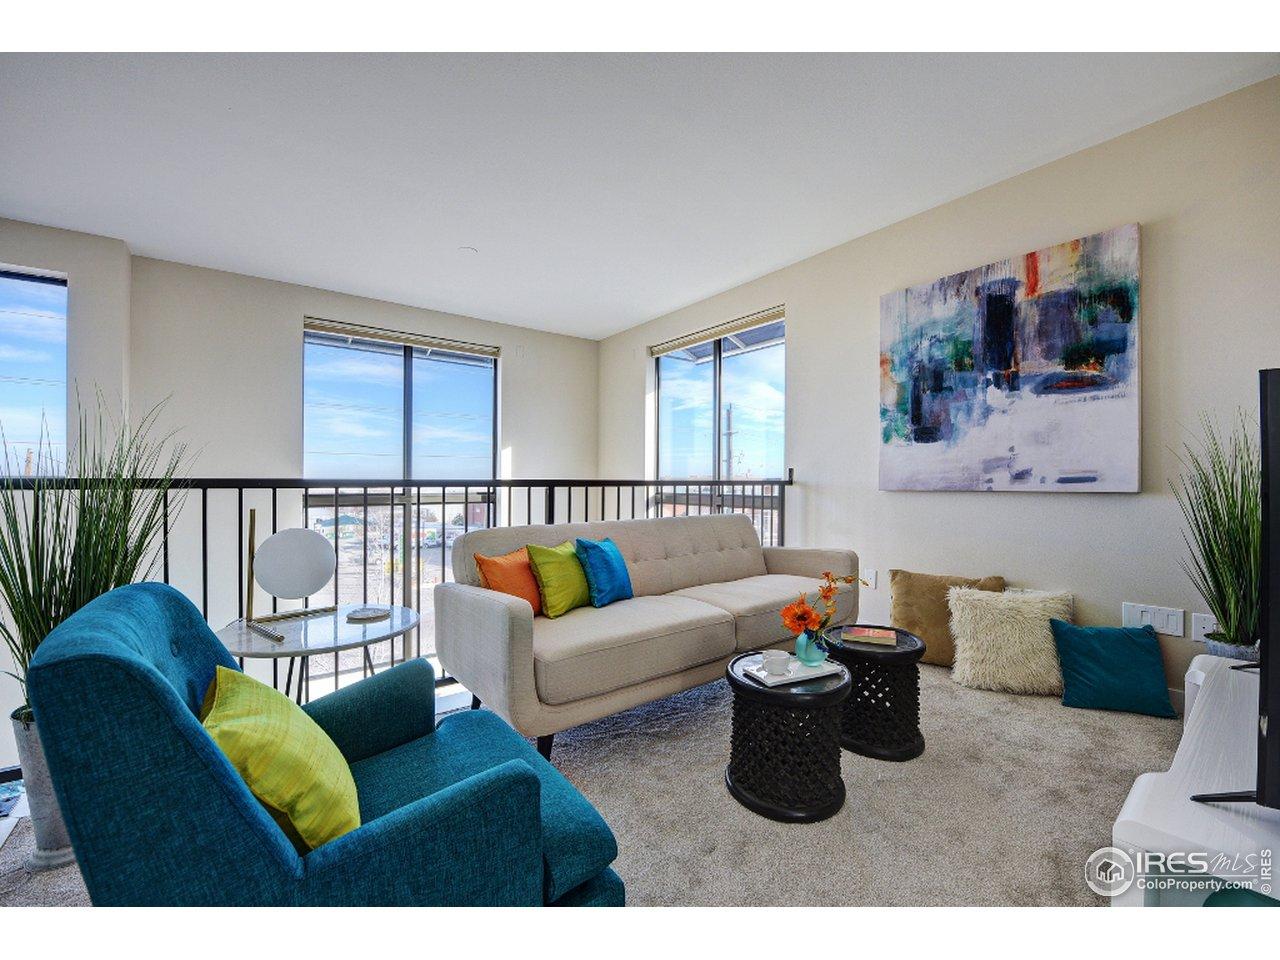 Upper living area/loft